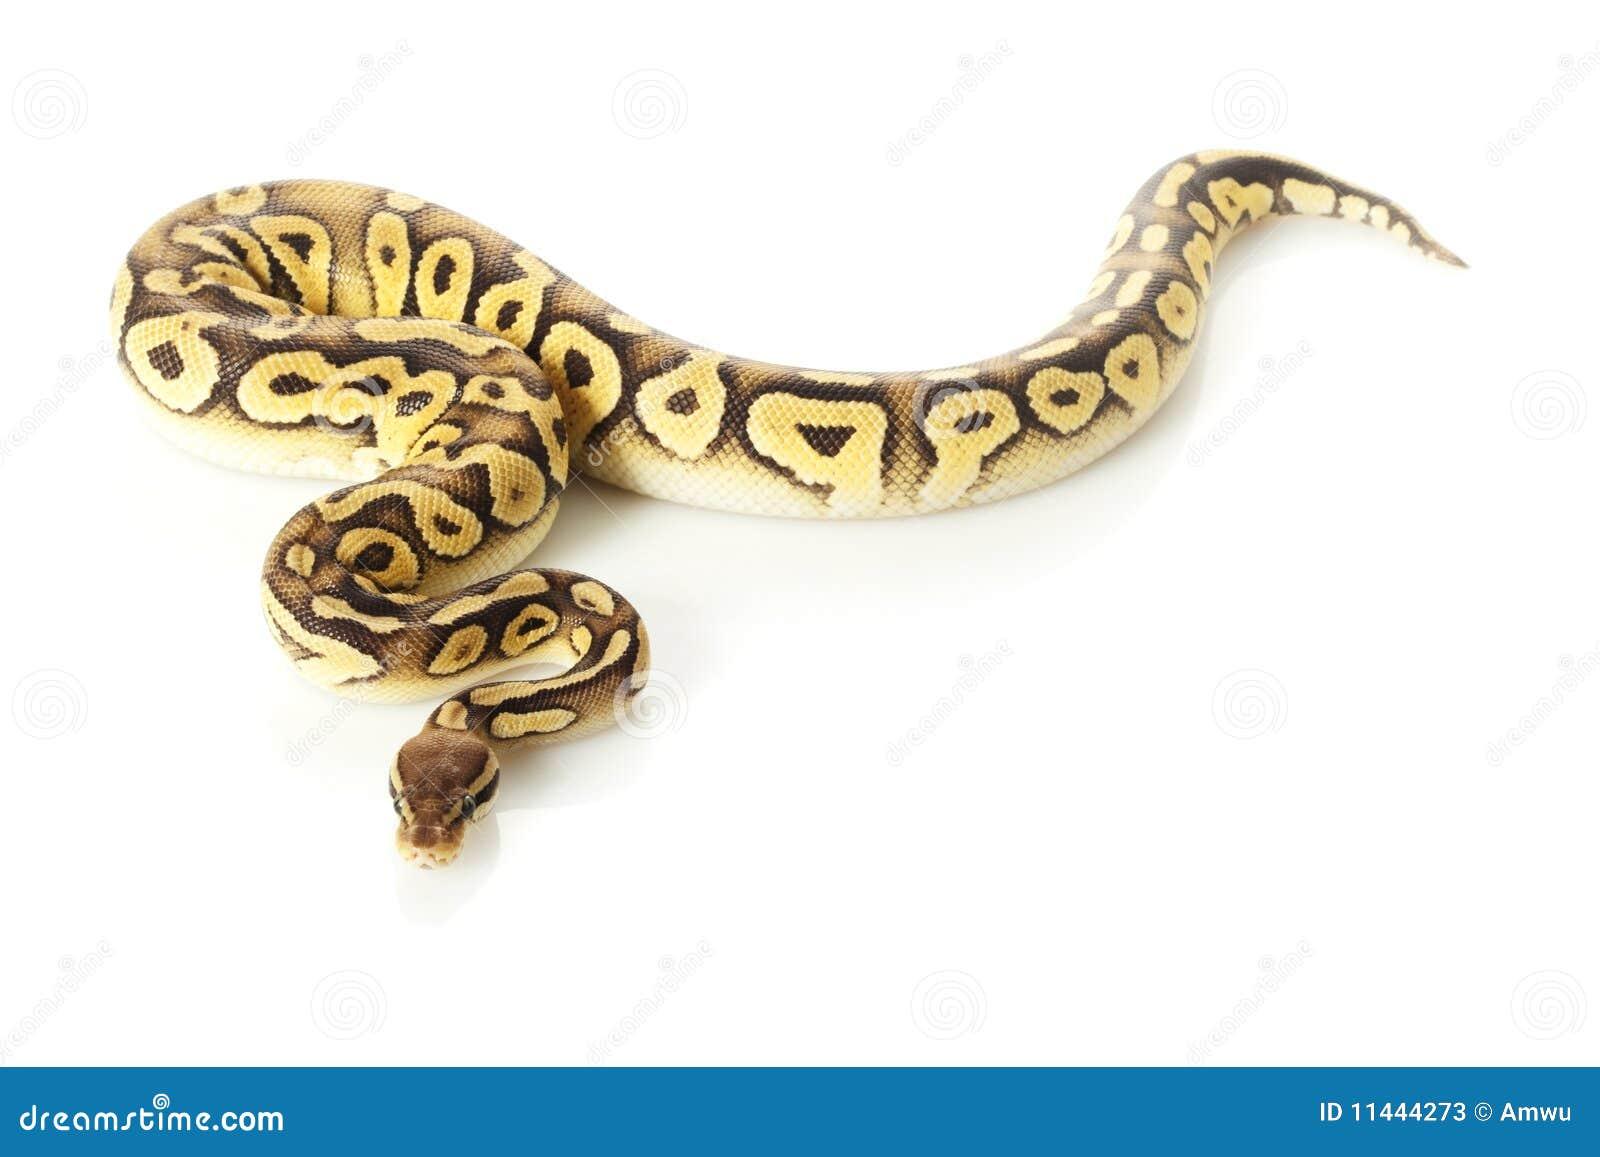 Pastave ball python  Python